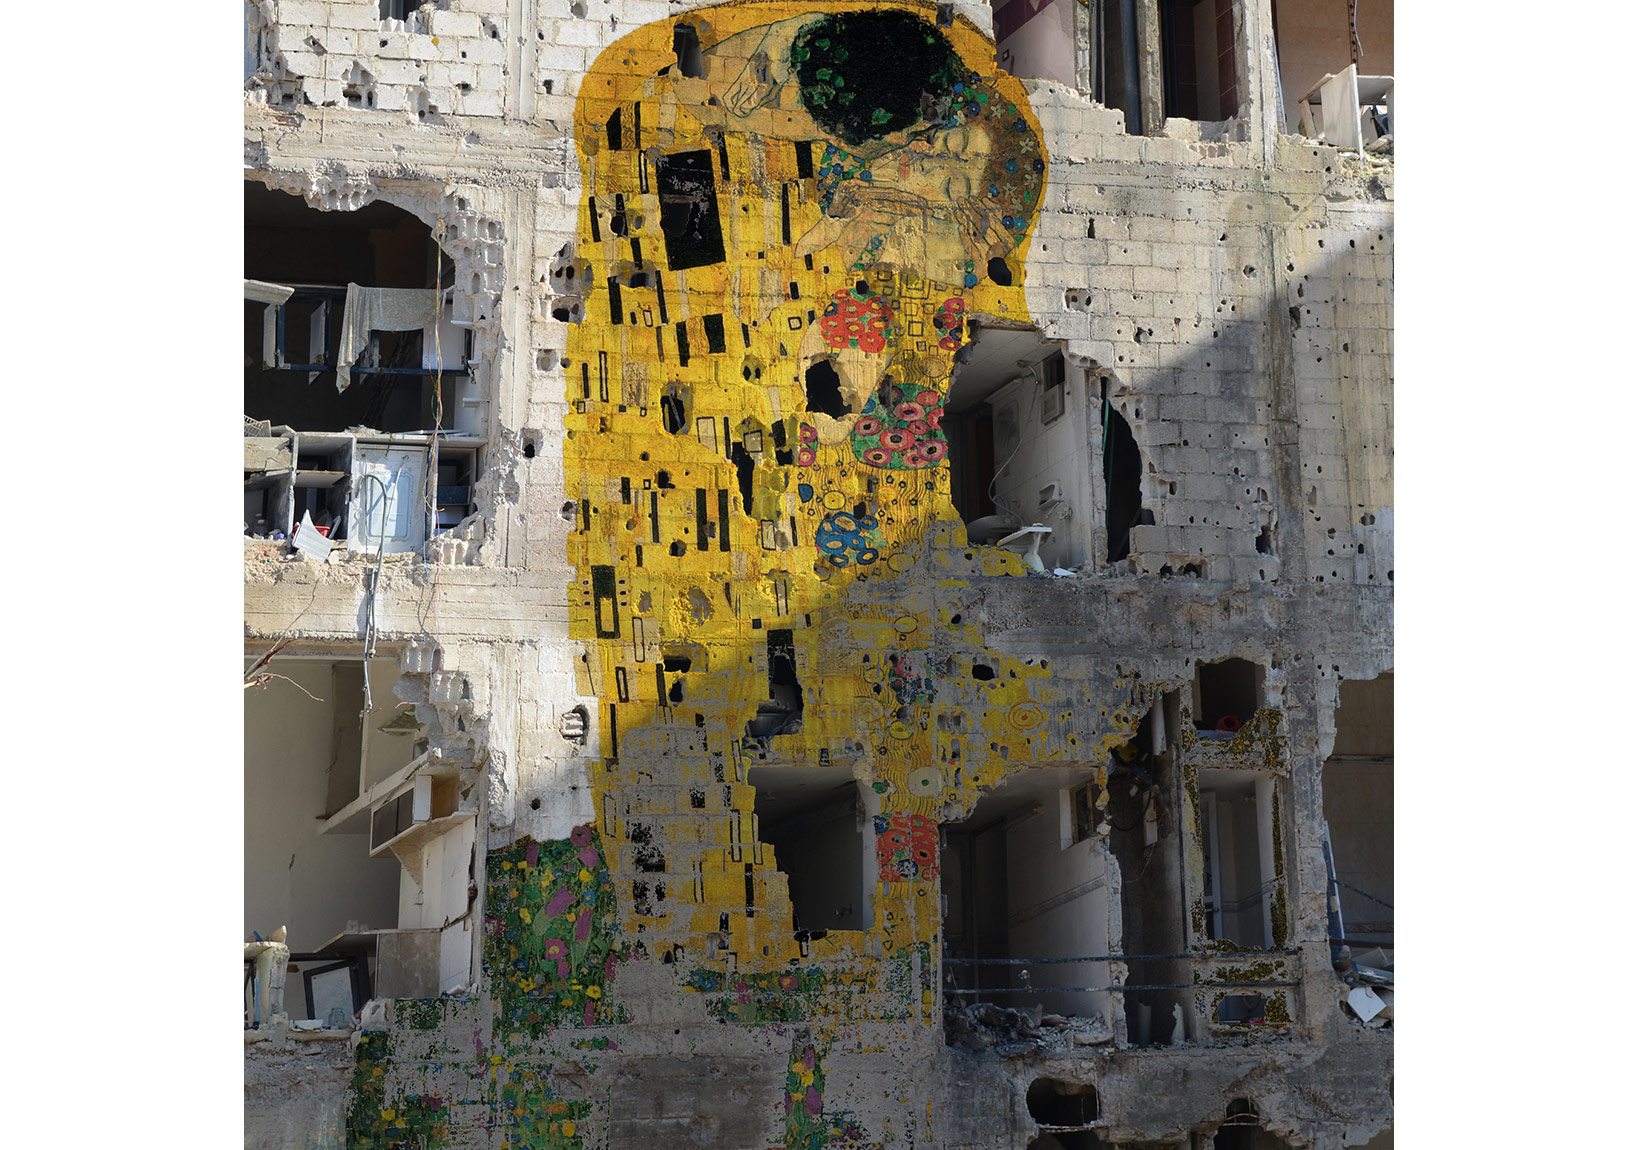 Tammam Azzam Freedom Graffiti, 150x150cm, Archival Print, 2012, Edition of 5